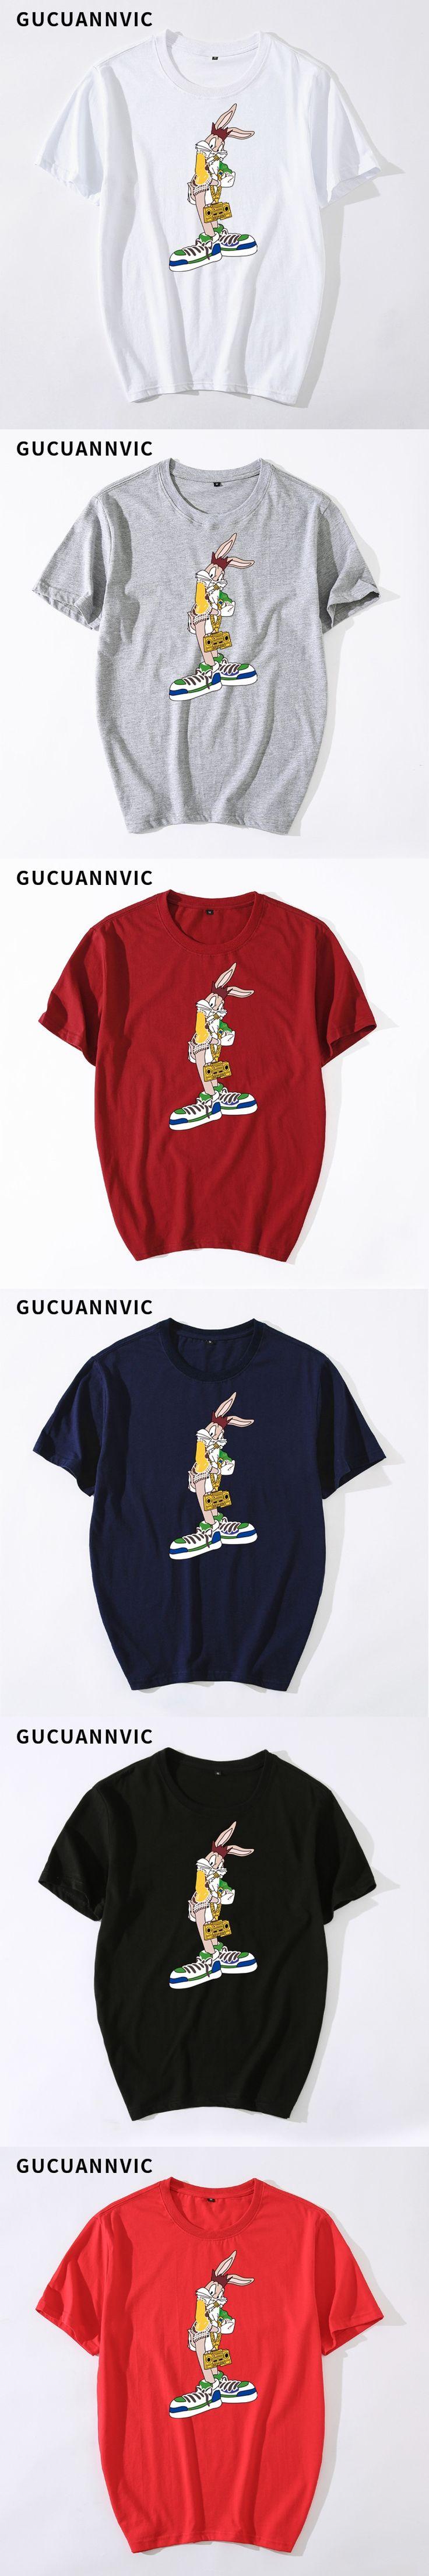 Fashion Style t shirt animal print tee shirts men 3d t-shirt clothes men short-sleeved casual round neck designer T-shirt